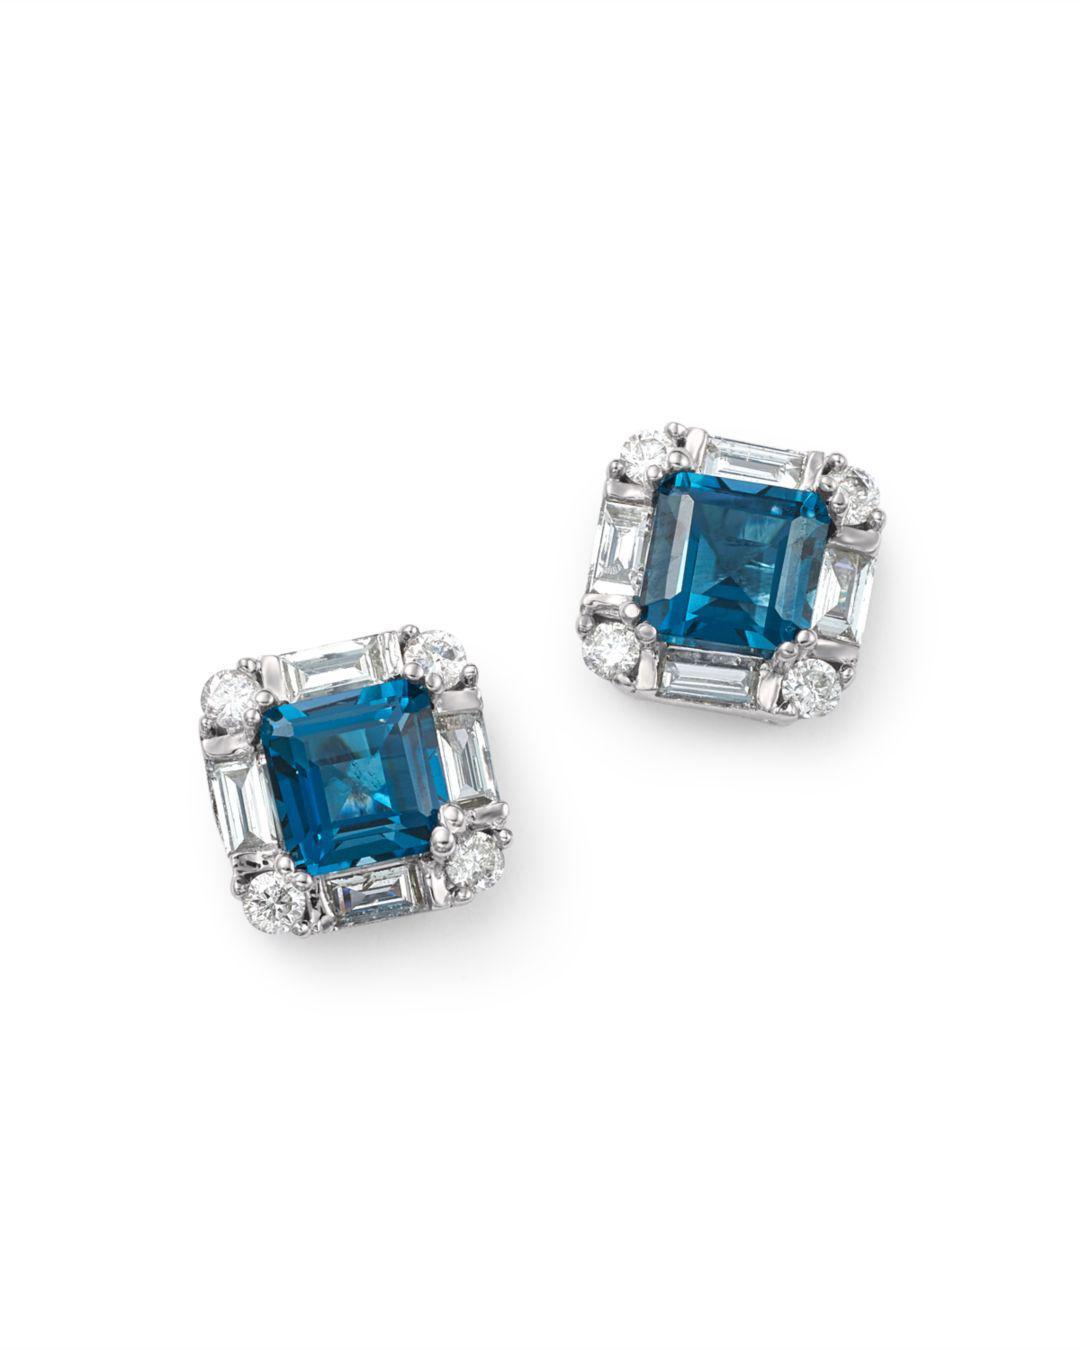 1b9233a5ea96 Bloomingdale s - London Blue Topaz   Diamond Square Stud Earrings In 14k  White Gold - Lyst. View fullscreen